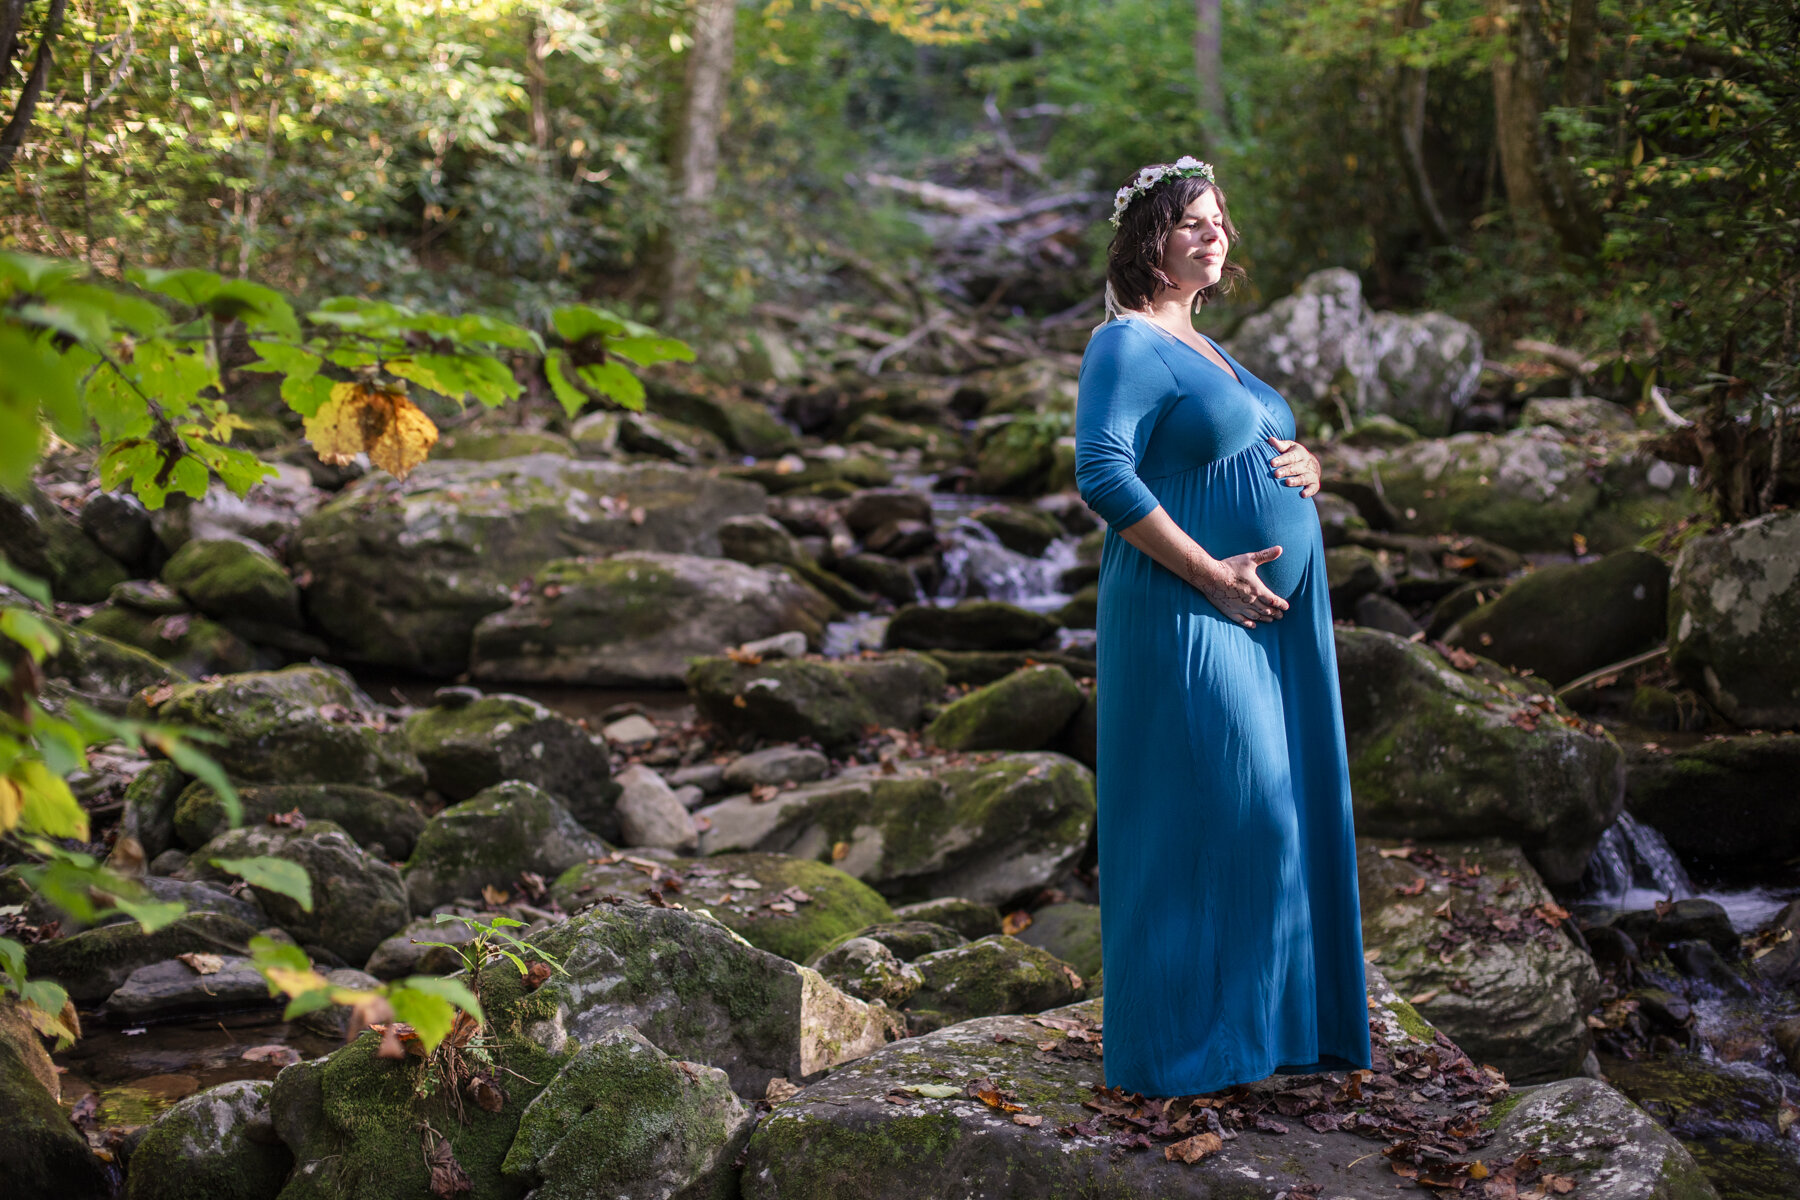 Avyanna and Phoenix Maternity Session 2019_photos by Studio Misha_BLOG-3.jpg